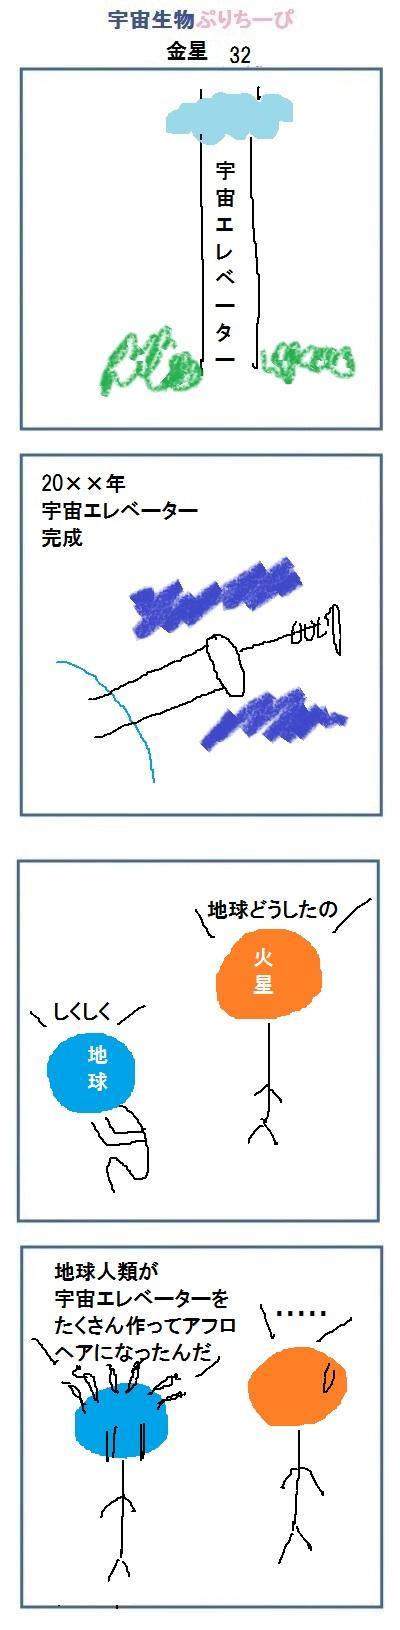 160627_kinsei32.jpg